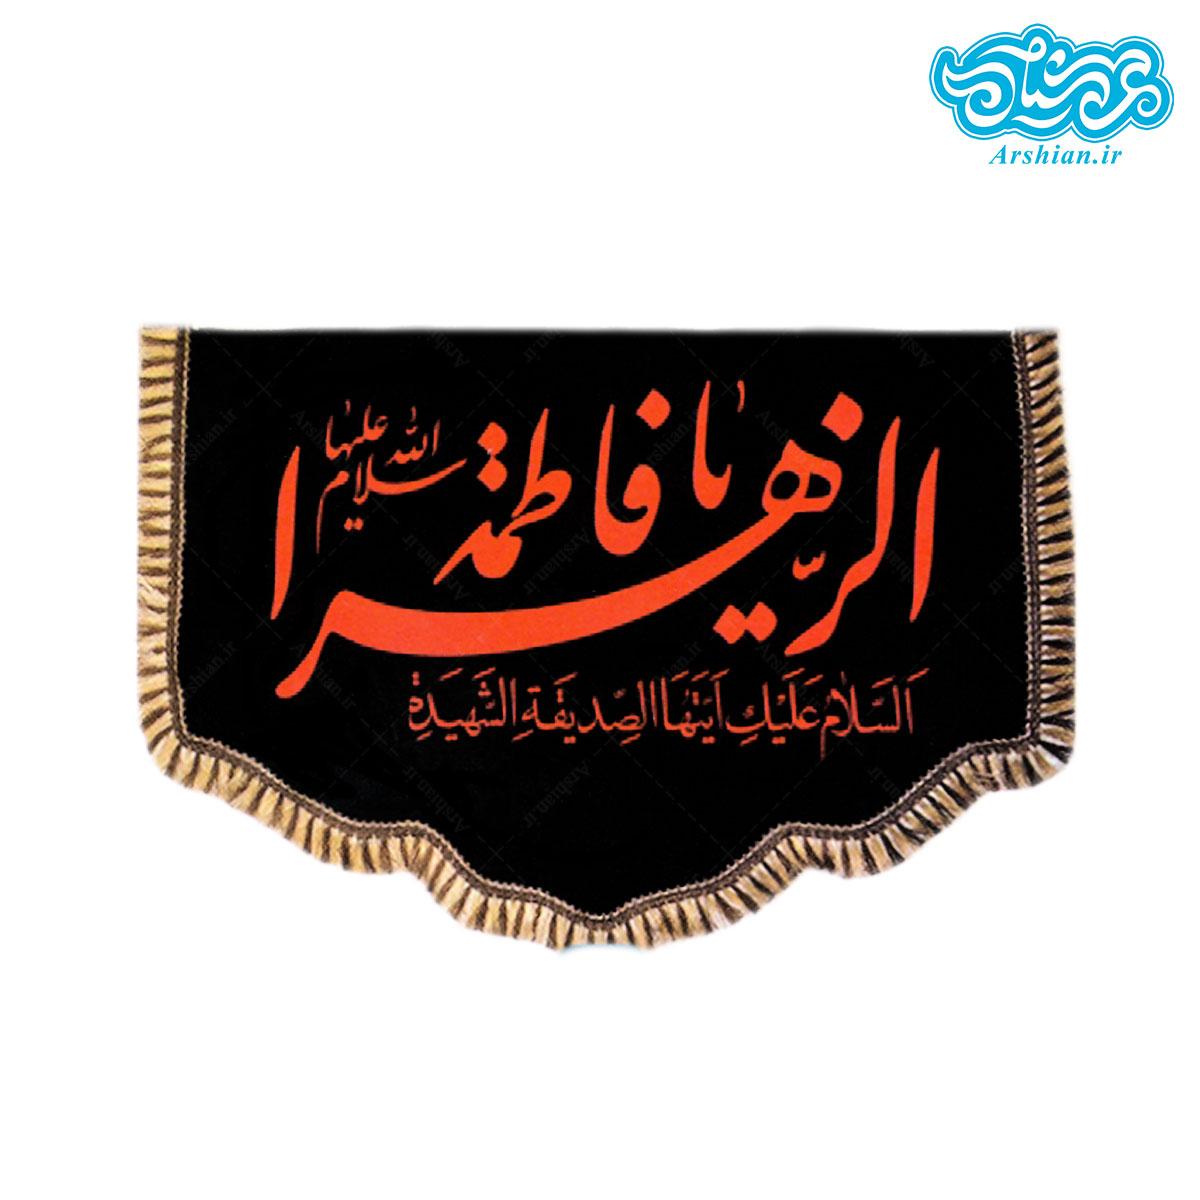 پرچم مخمل یافاطمه الزهرا کد015